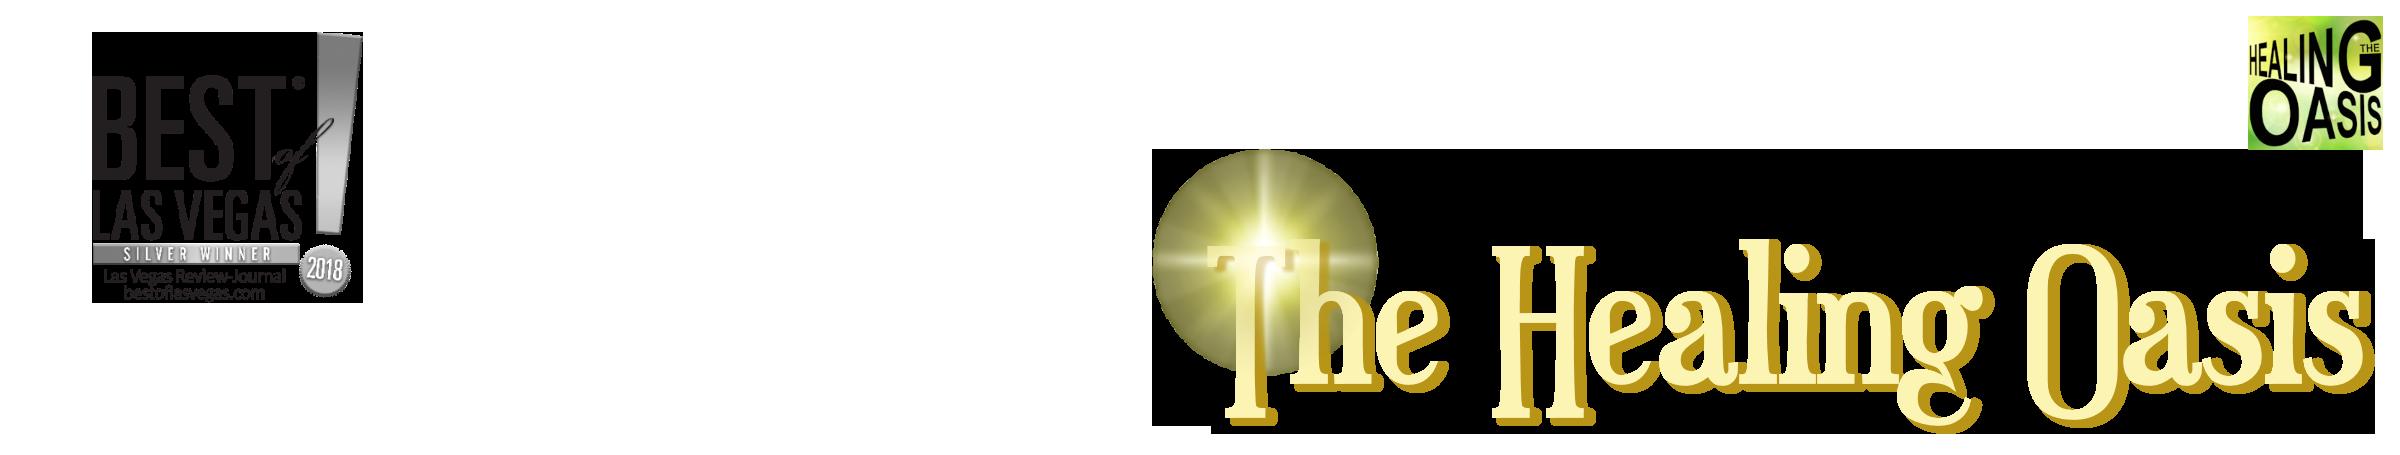 The Healing Oasis Logo